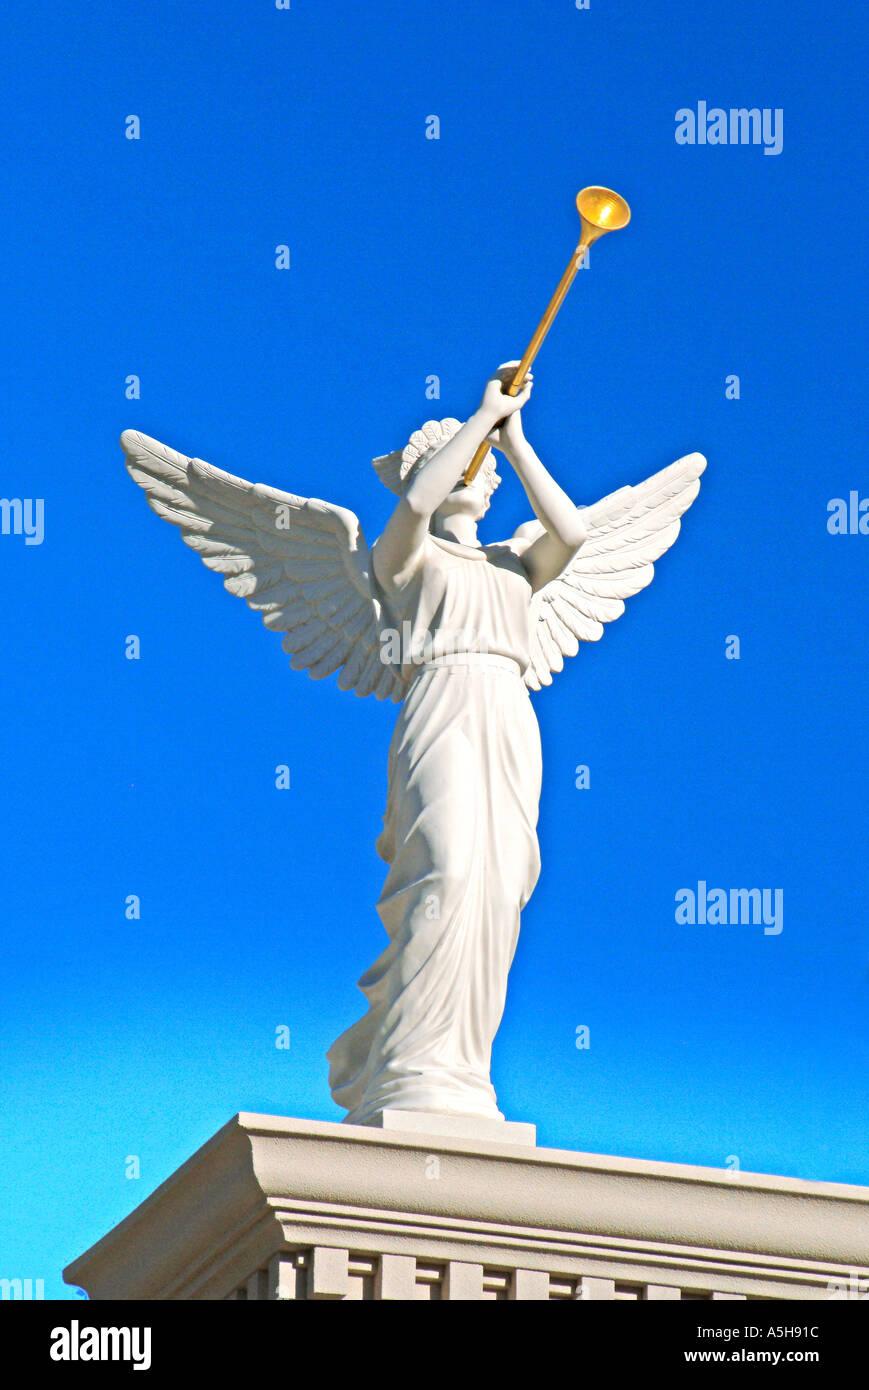 angel blowing